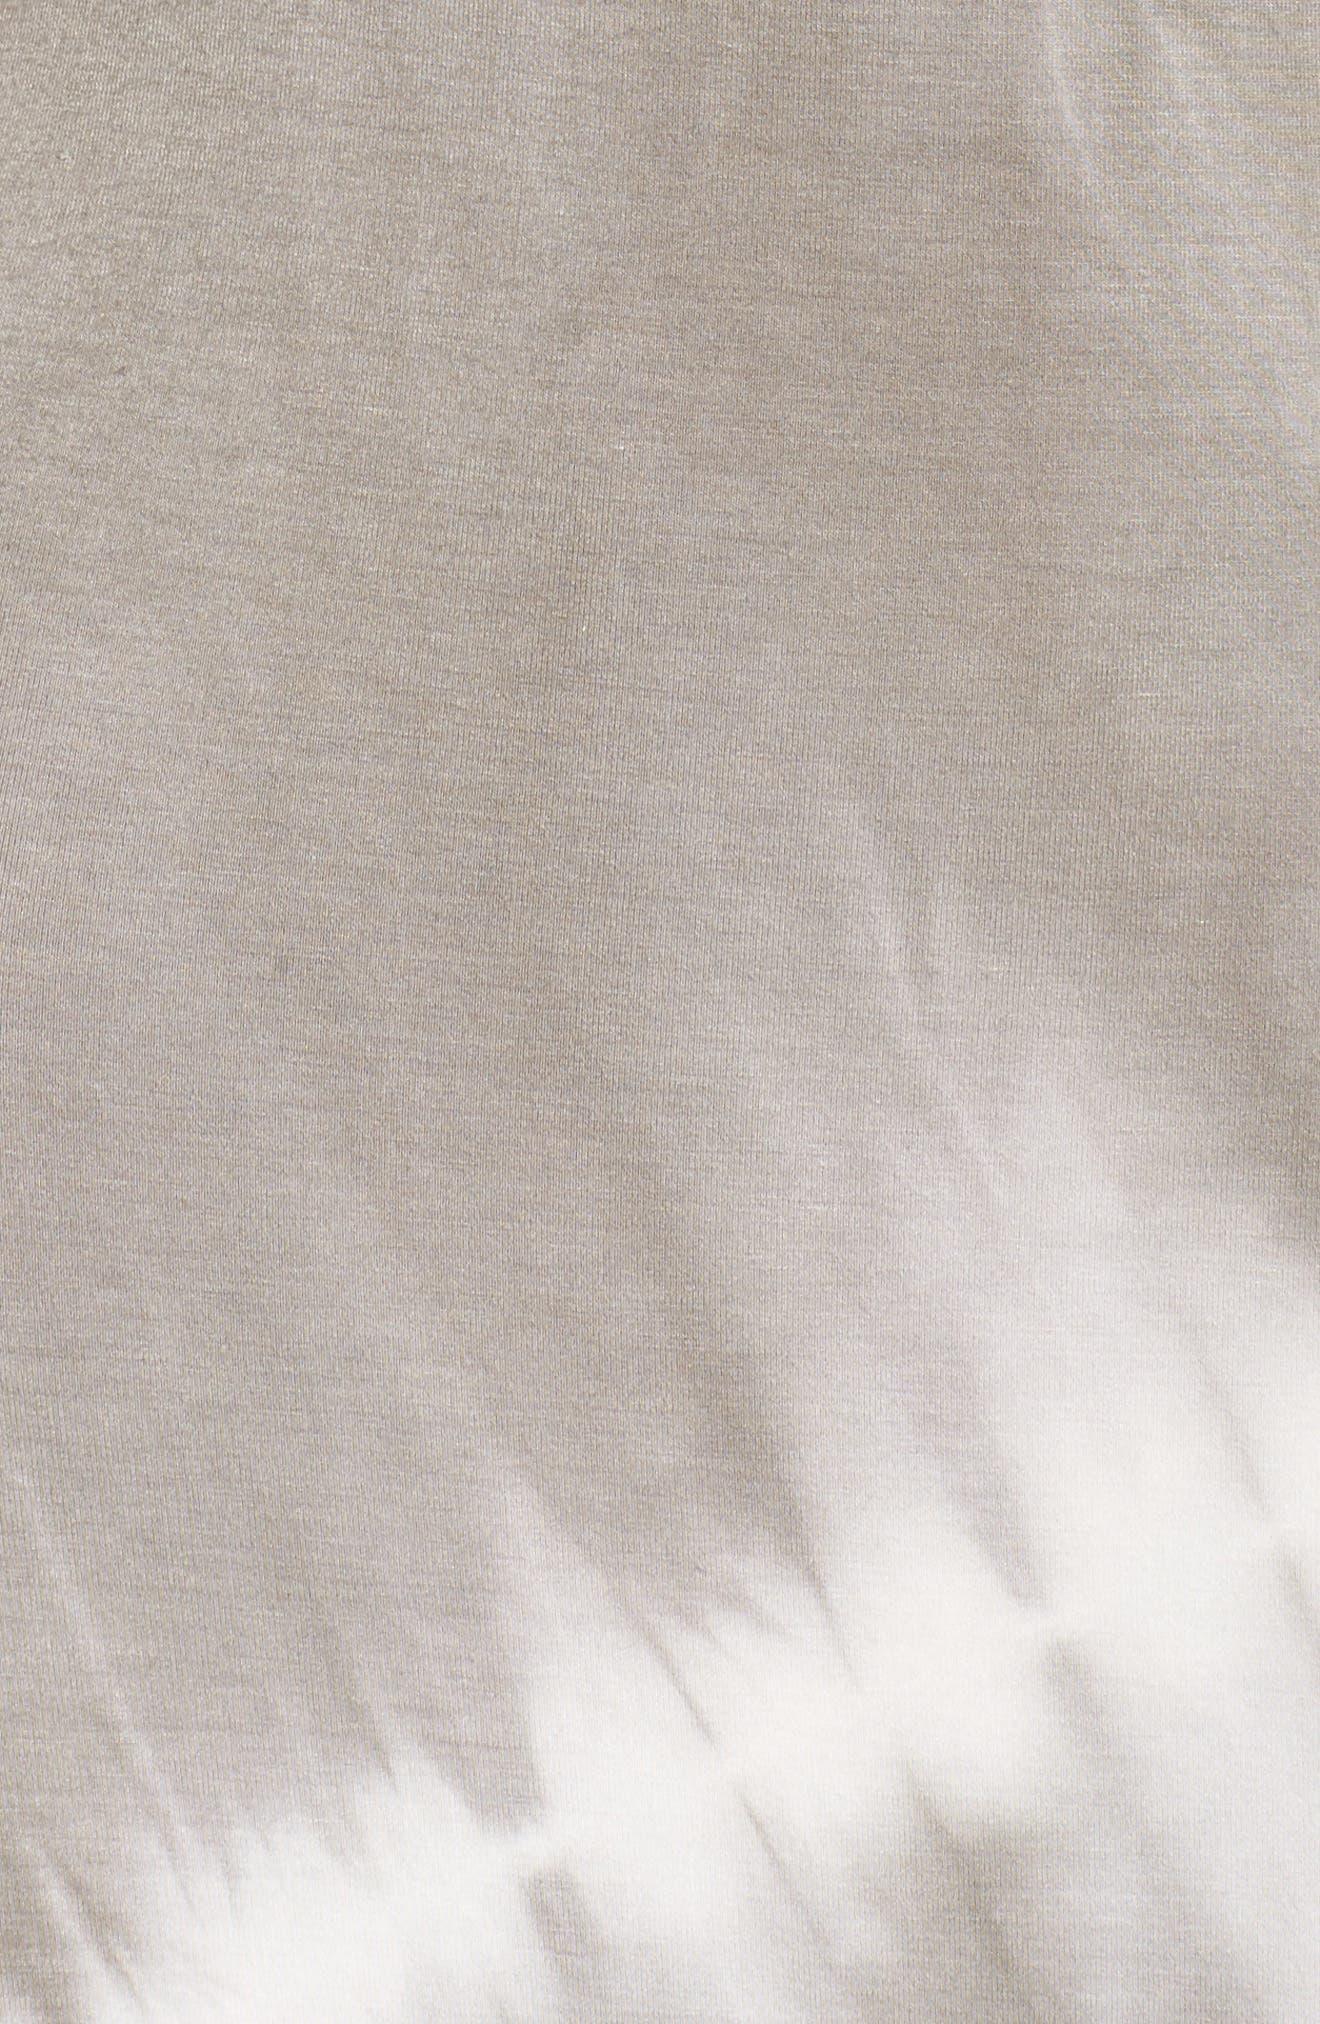 Tie Dye Racerback Maxi Dress,                             Alternate thumbnail 6, color,                             GREY/ WHITE